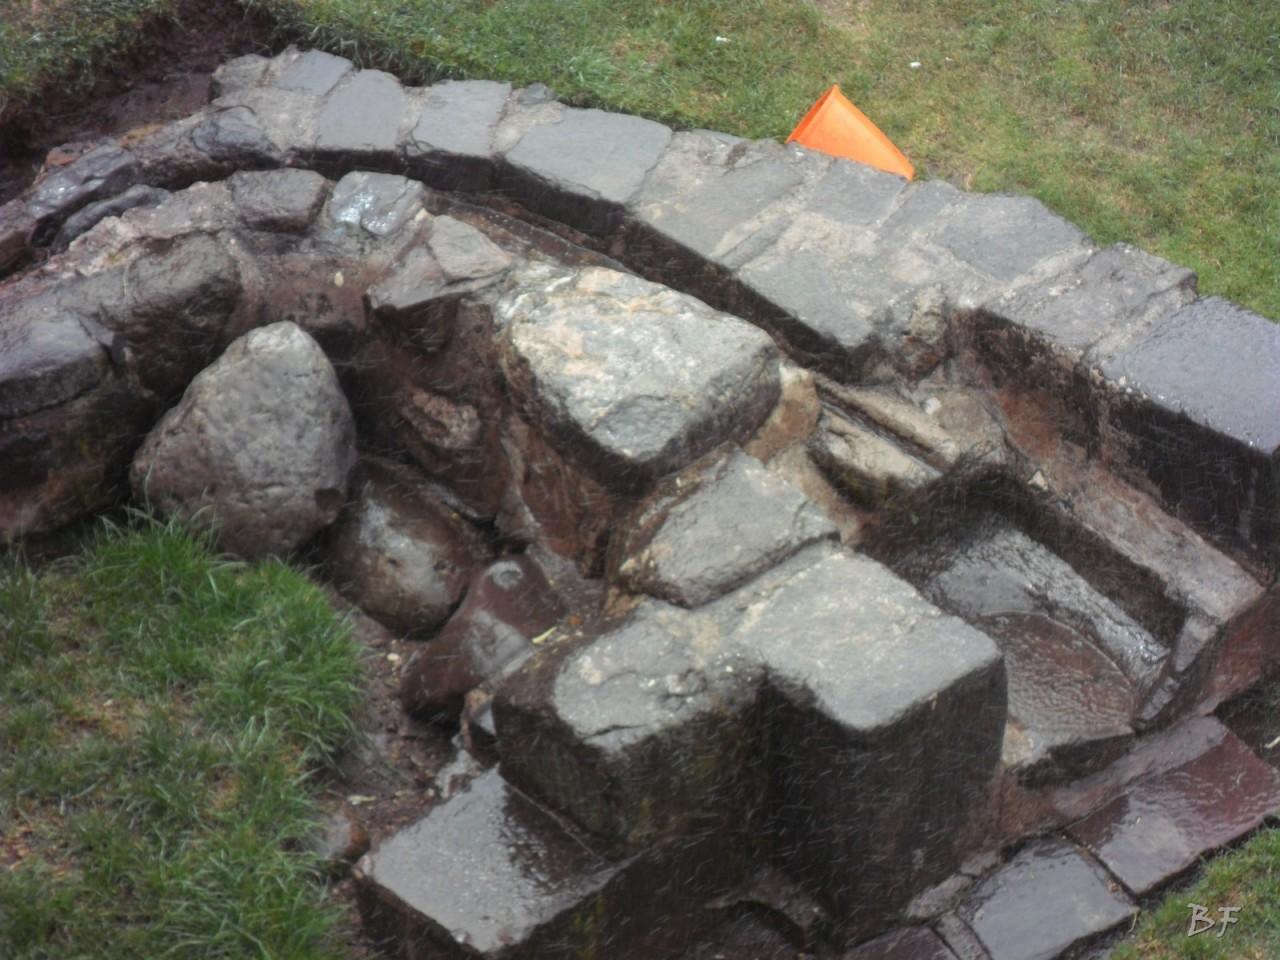 Mura-Poligonali-Megaliti-Tempio-Coricancha-Cusco-Perù-1